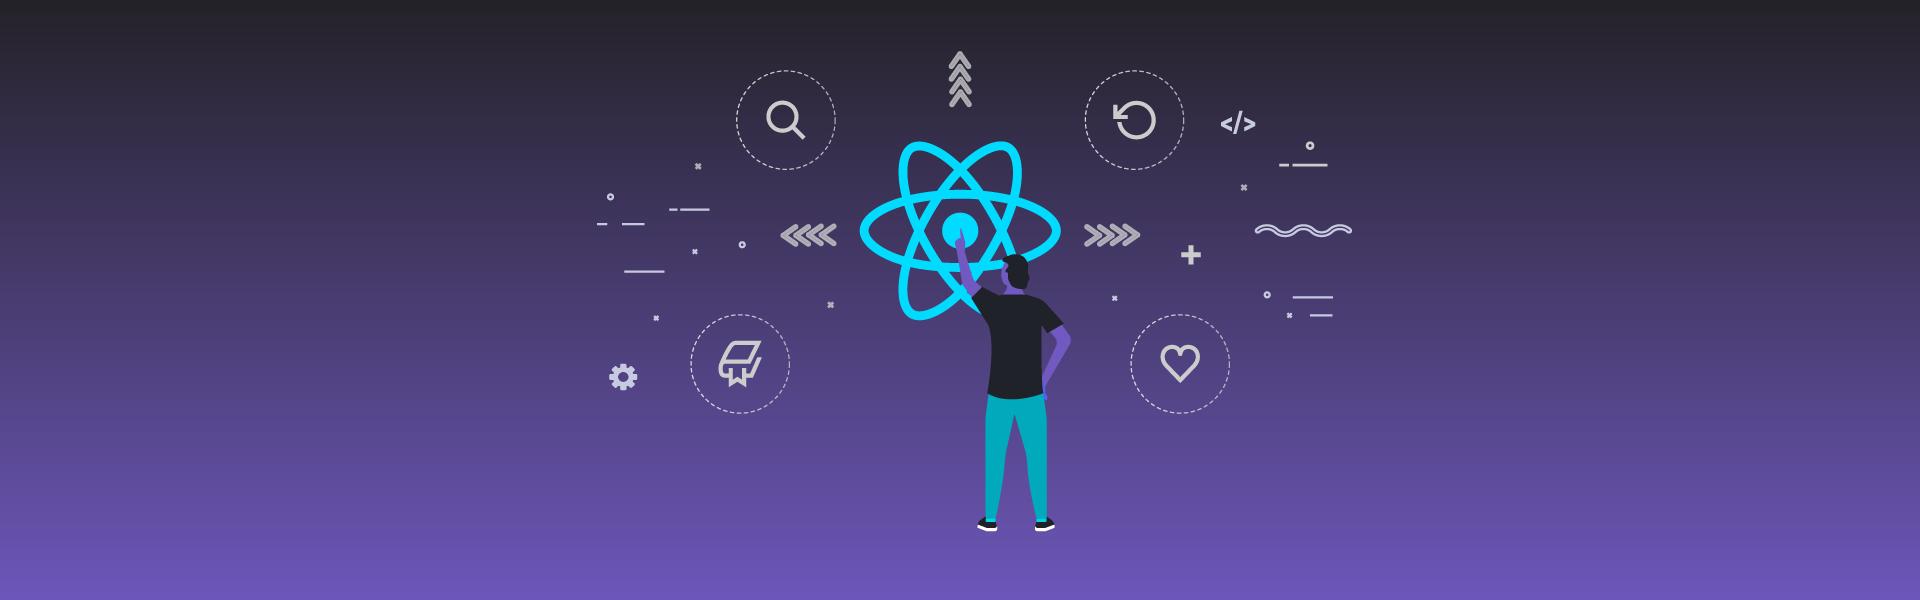 React Native Tools and React Development Tools